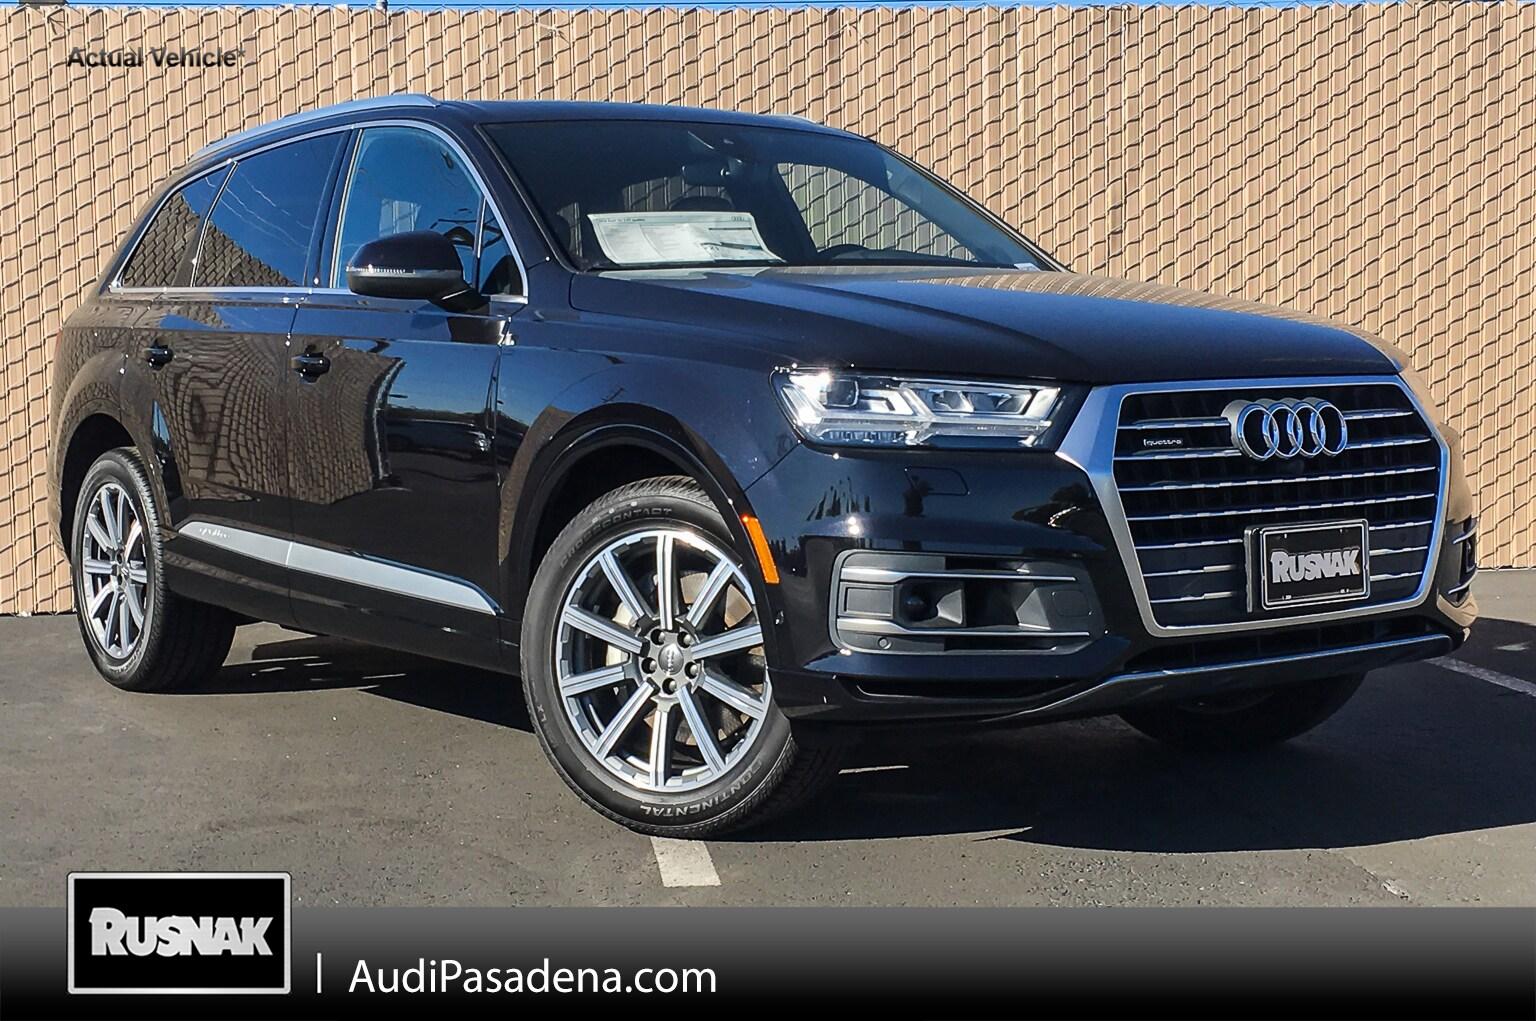 2019 Audi Q7 Galaxy Blue Audi Cars Review Release